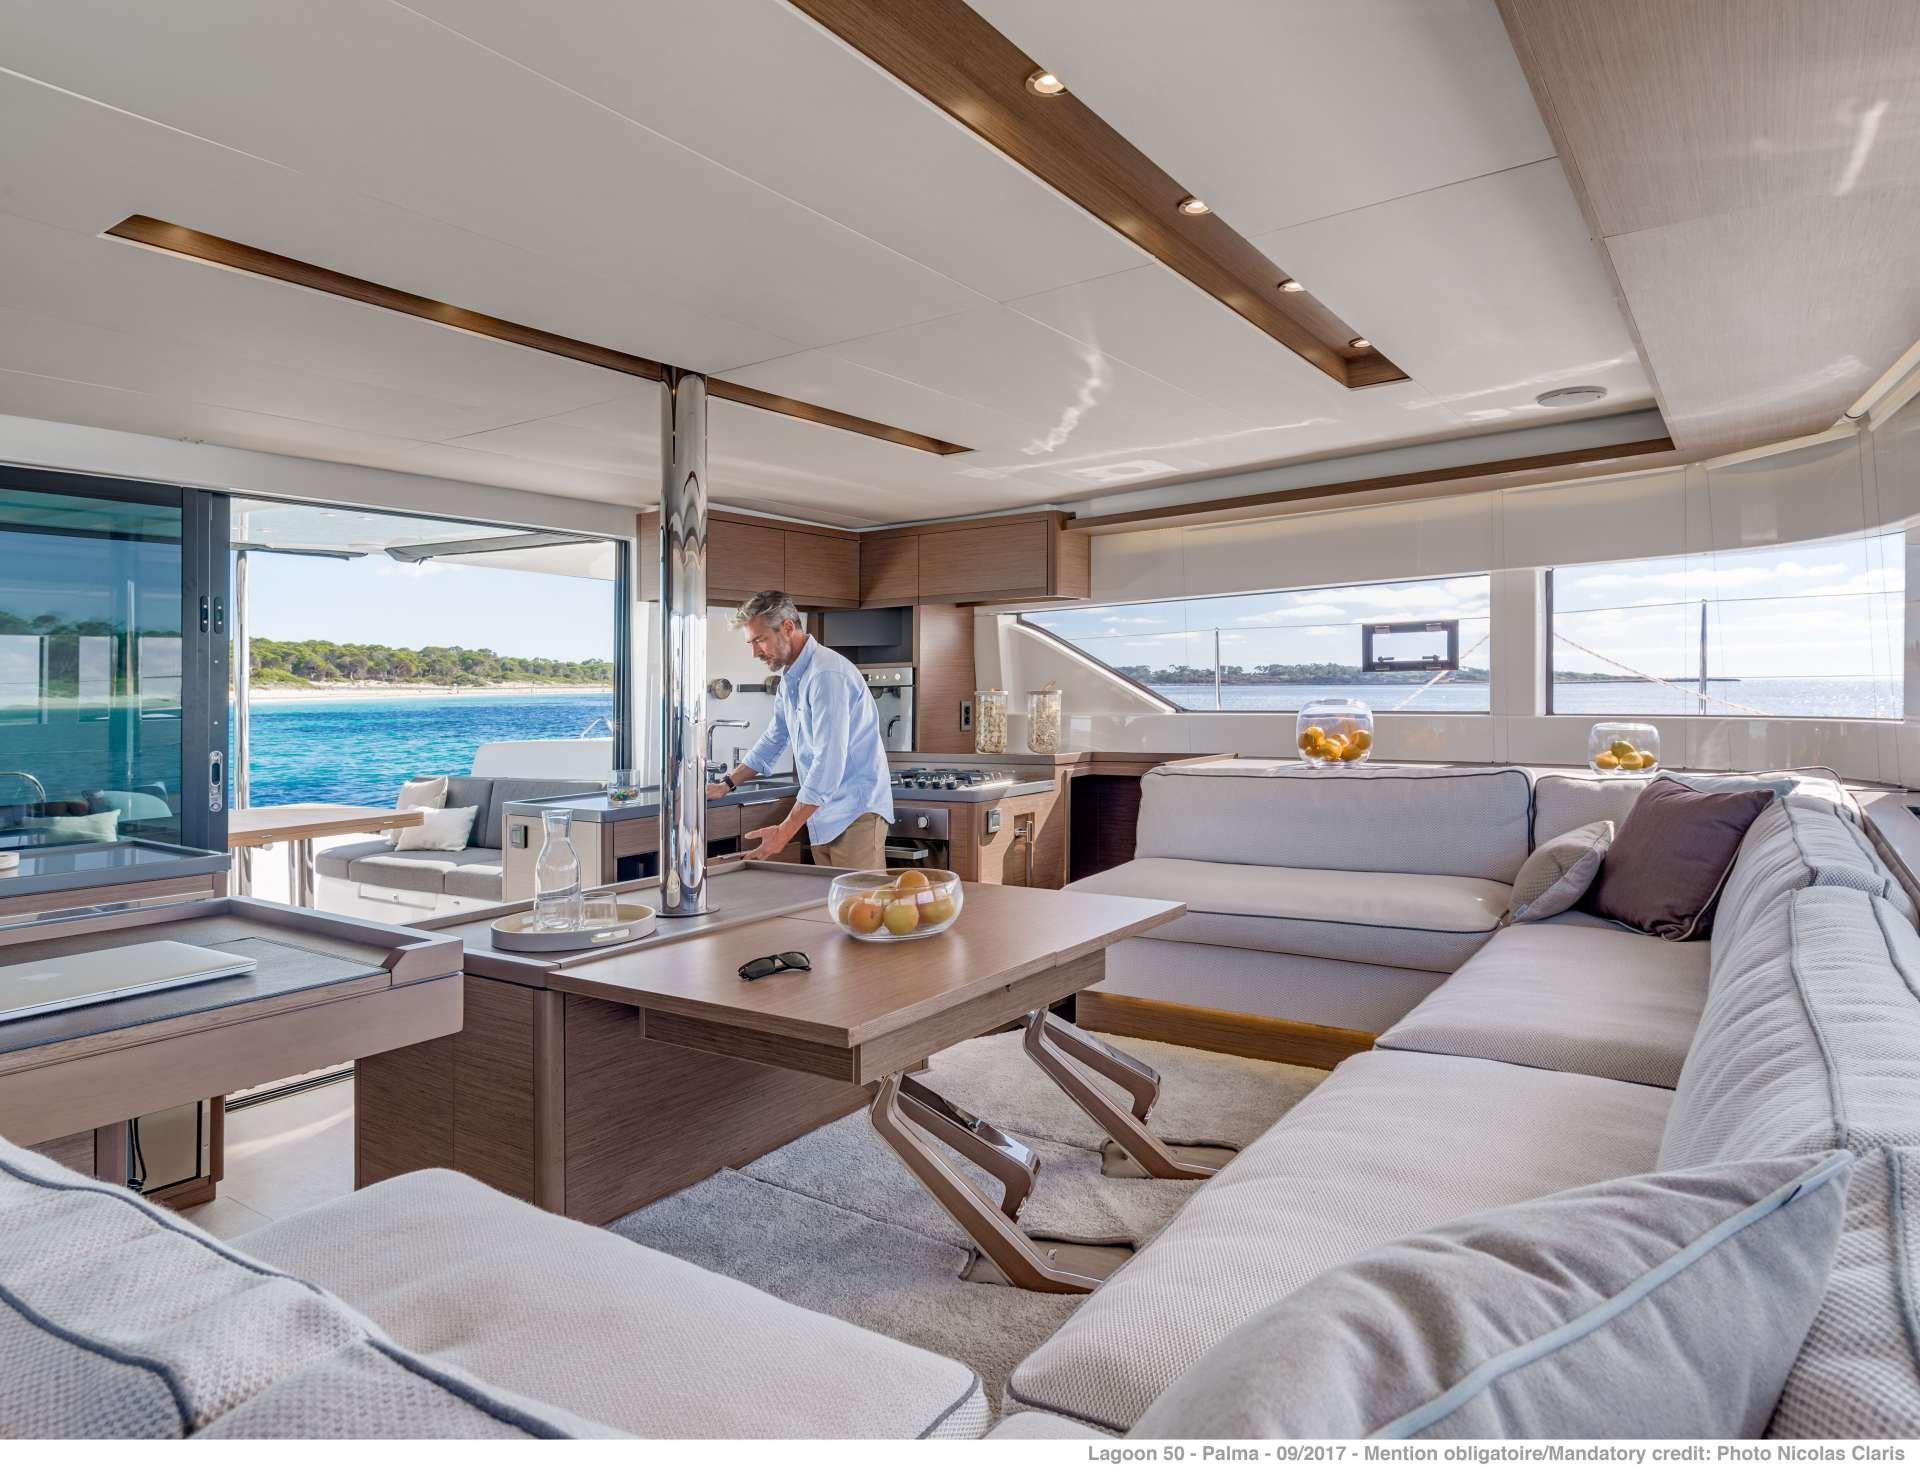 Catamaran Yacht 'NAUTI CAT', 8 PAX, 2 Crew, 50.00 Ft, 15.00 Meters, Built 2020, Lagoon